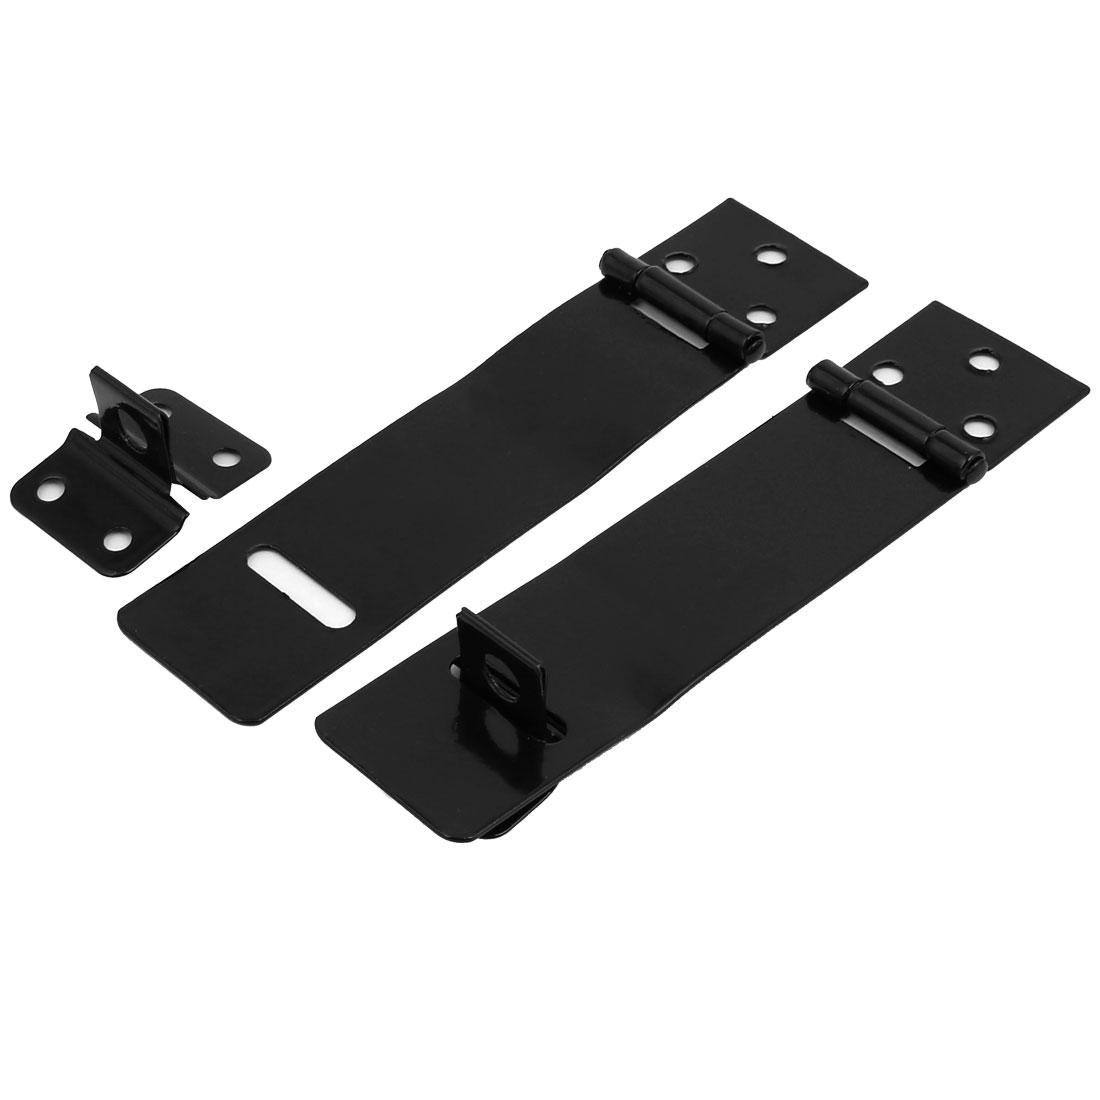 2pcs Door Cabinet Clasp Gate Lock Padlock Latch Hasp Staple 137mm Length